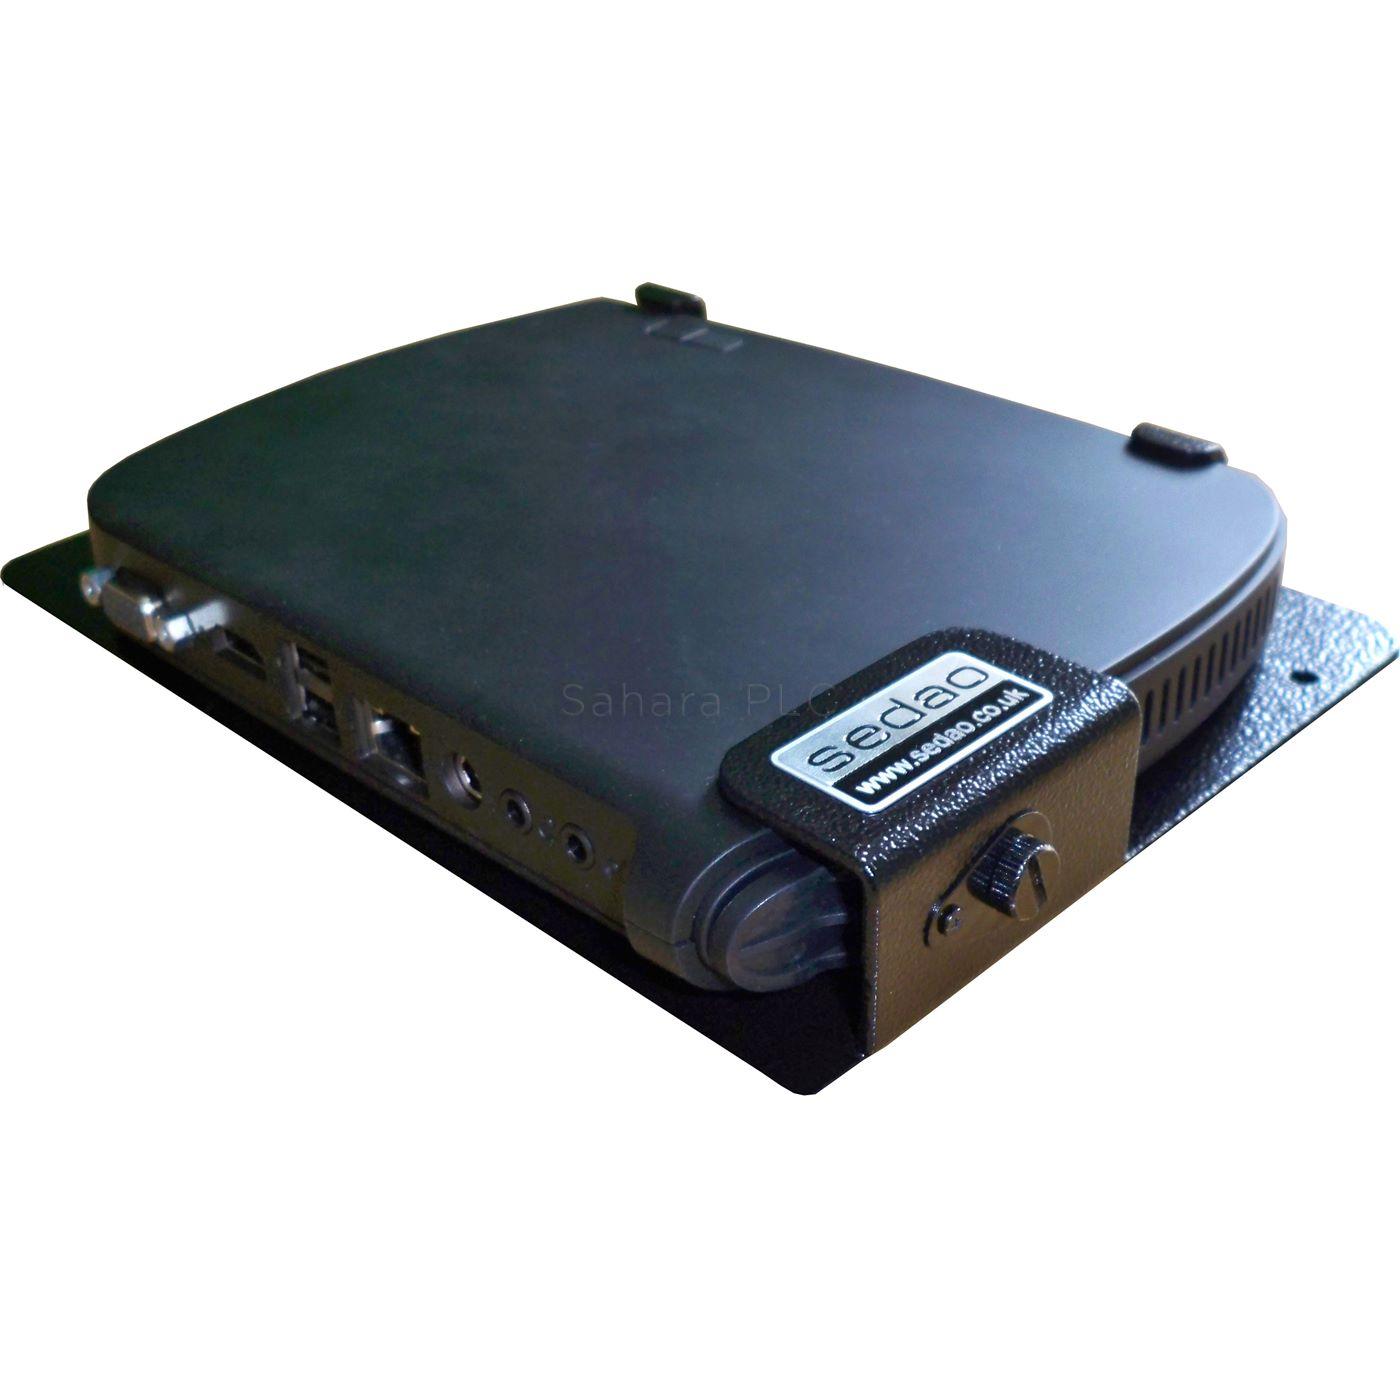 Enterprise level Digital Signage Player SWEP-V2-IF   Sahara AV